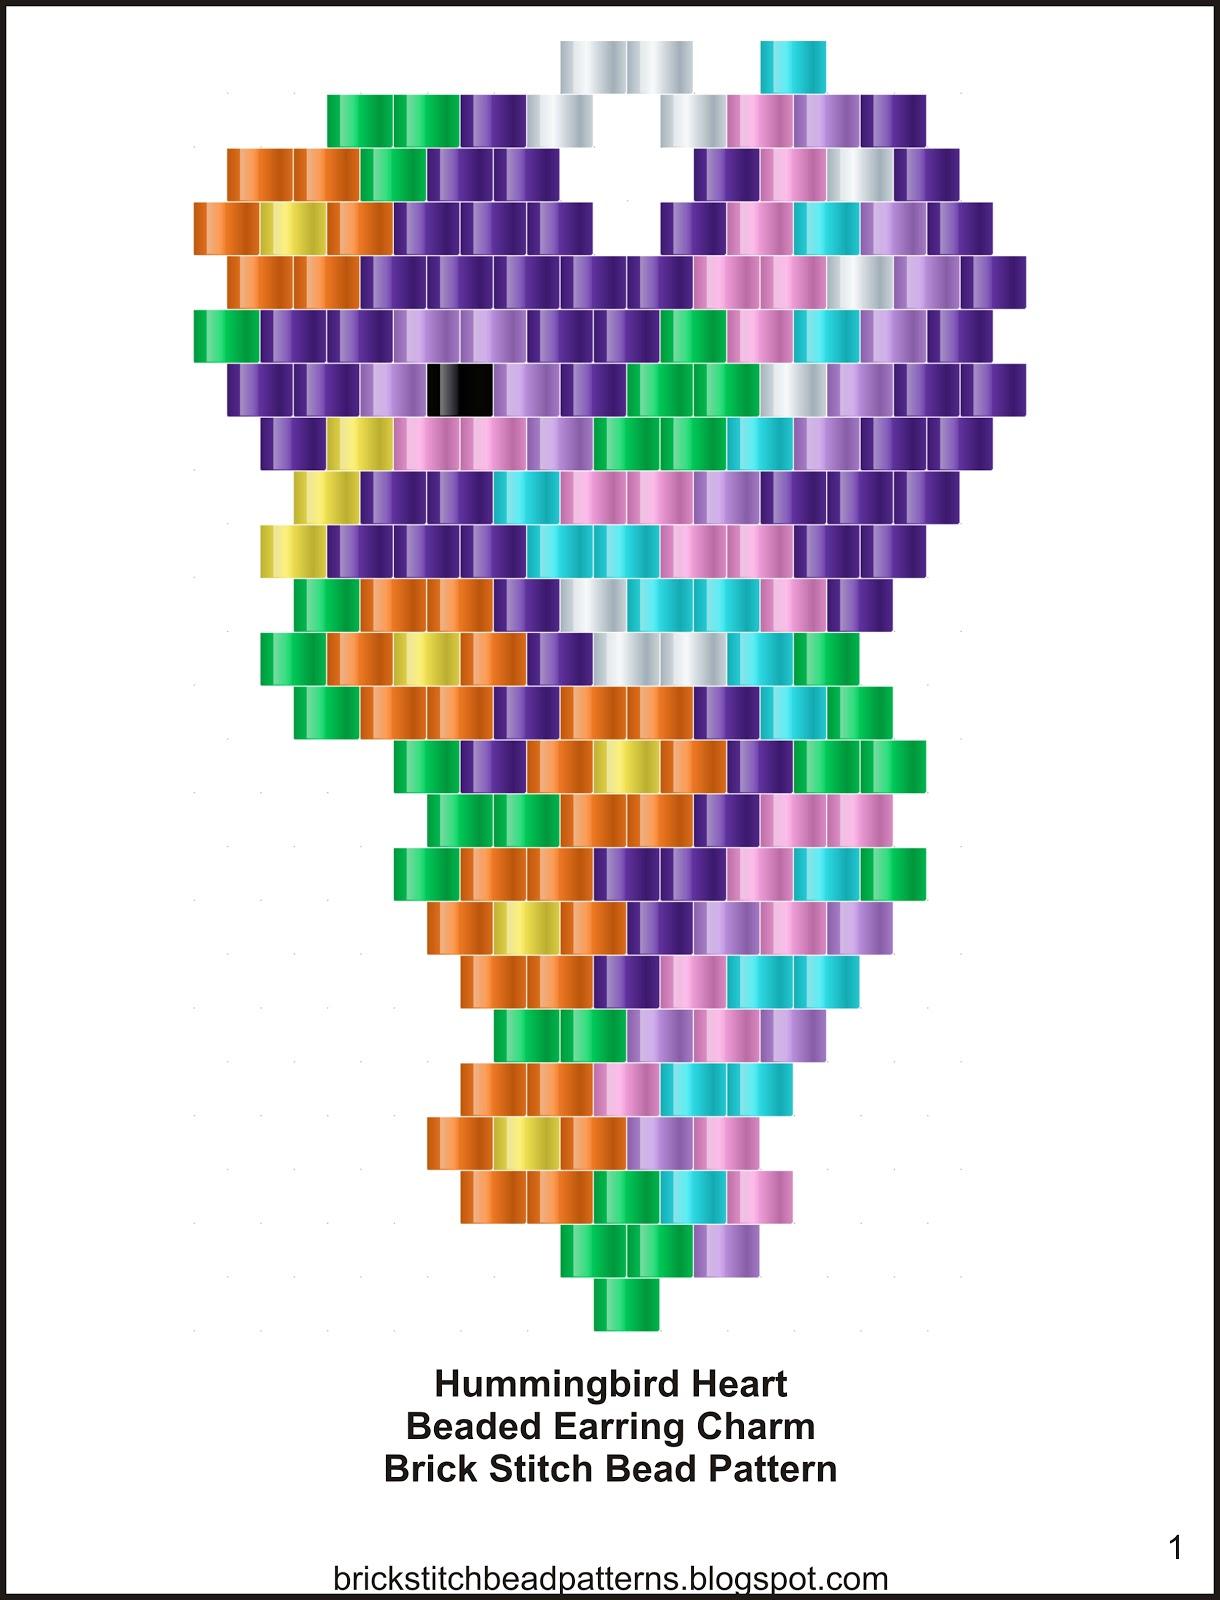 Brick Stitch Bead Patterns Journal: Hummingbird Heart ...